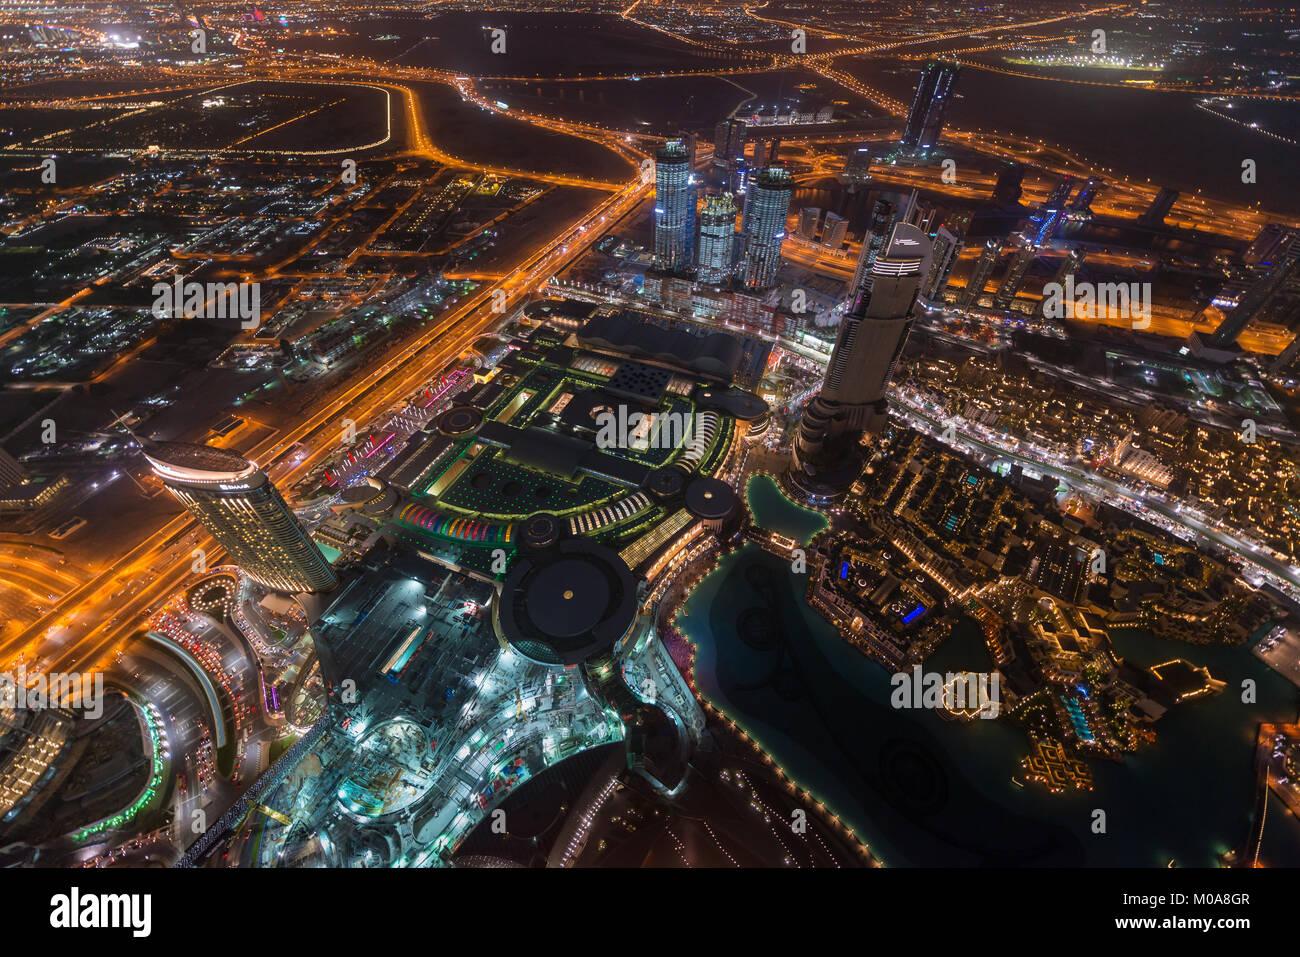 Vistas de la ciudad de Burj Khalifa, Dubai, Emiratos Árabes Unidos. Foto de stock